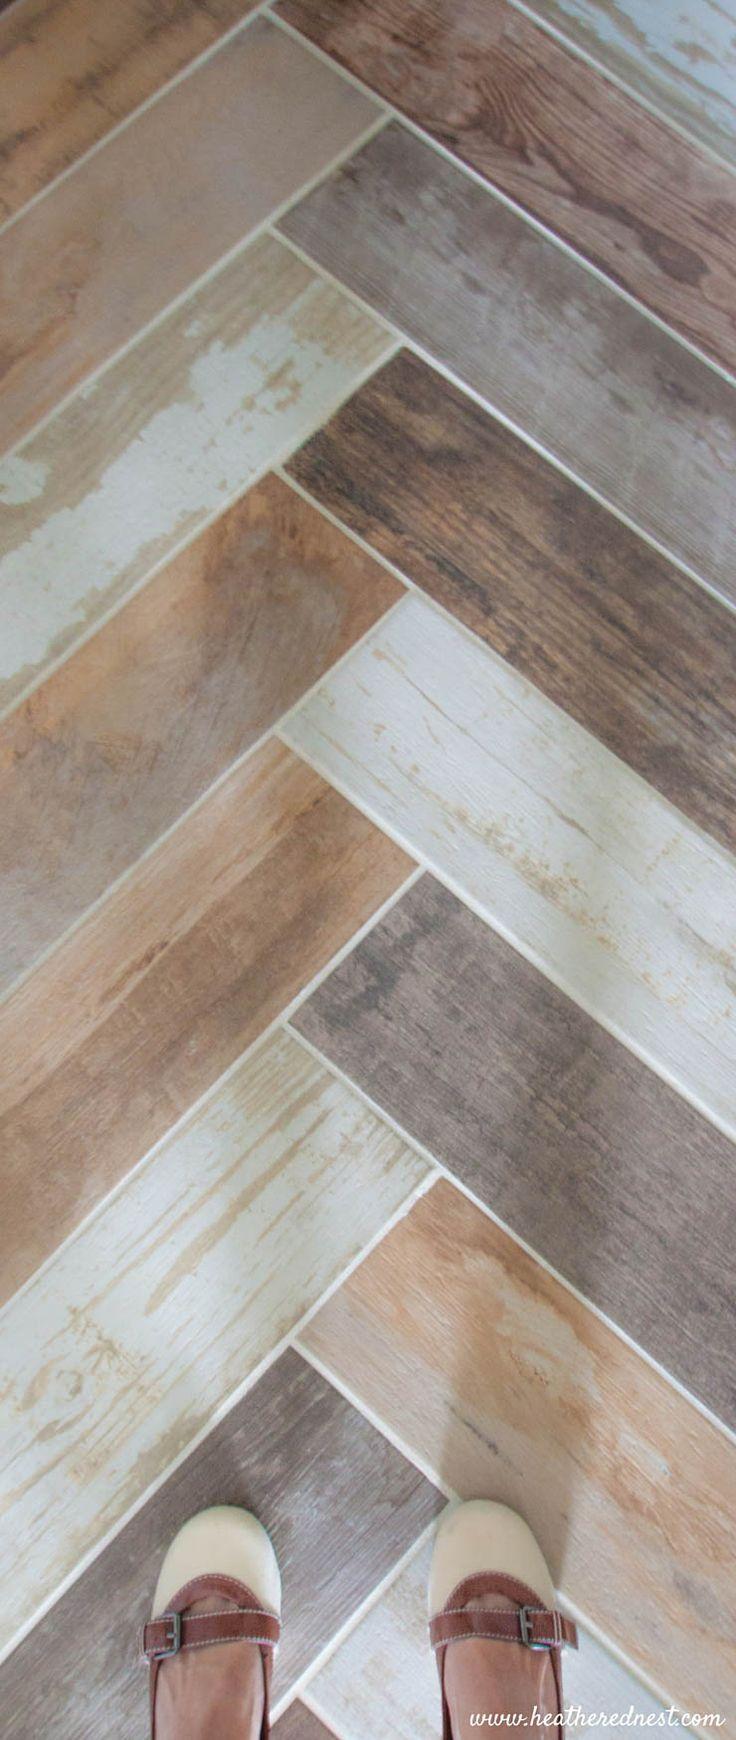 Best 25+ Faux wood tiles ideas on Pinterest | Faux wood ...